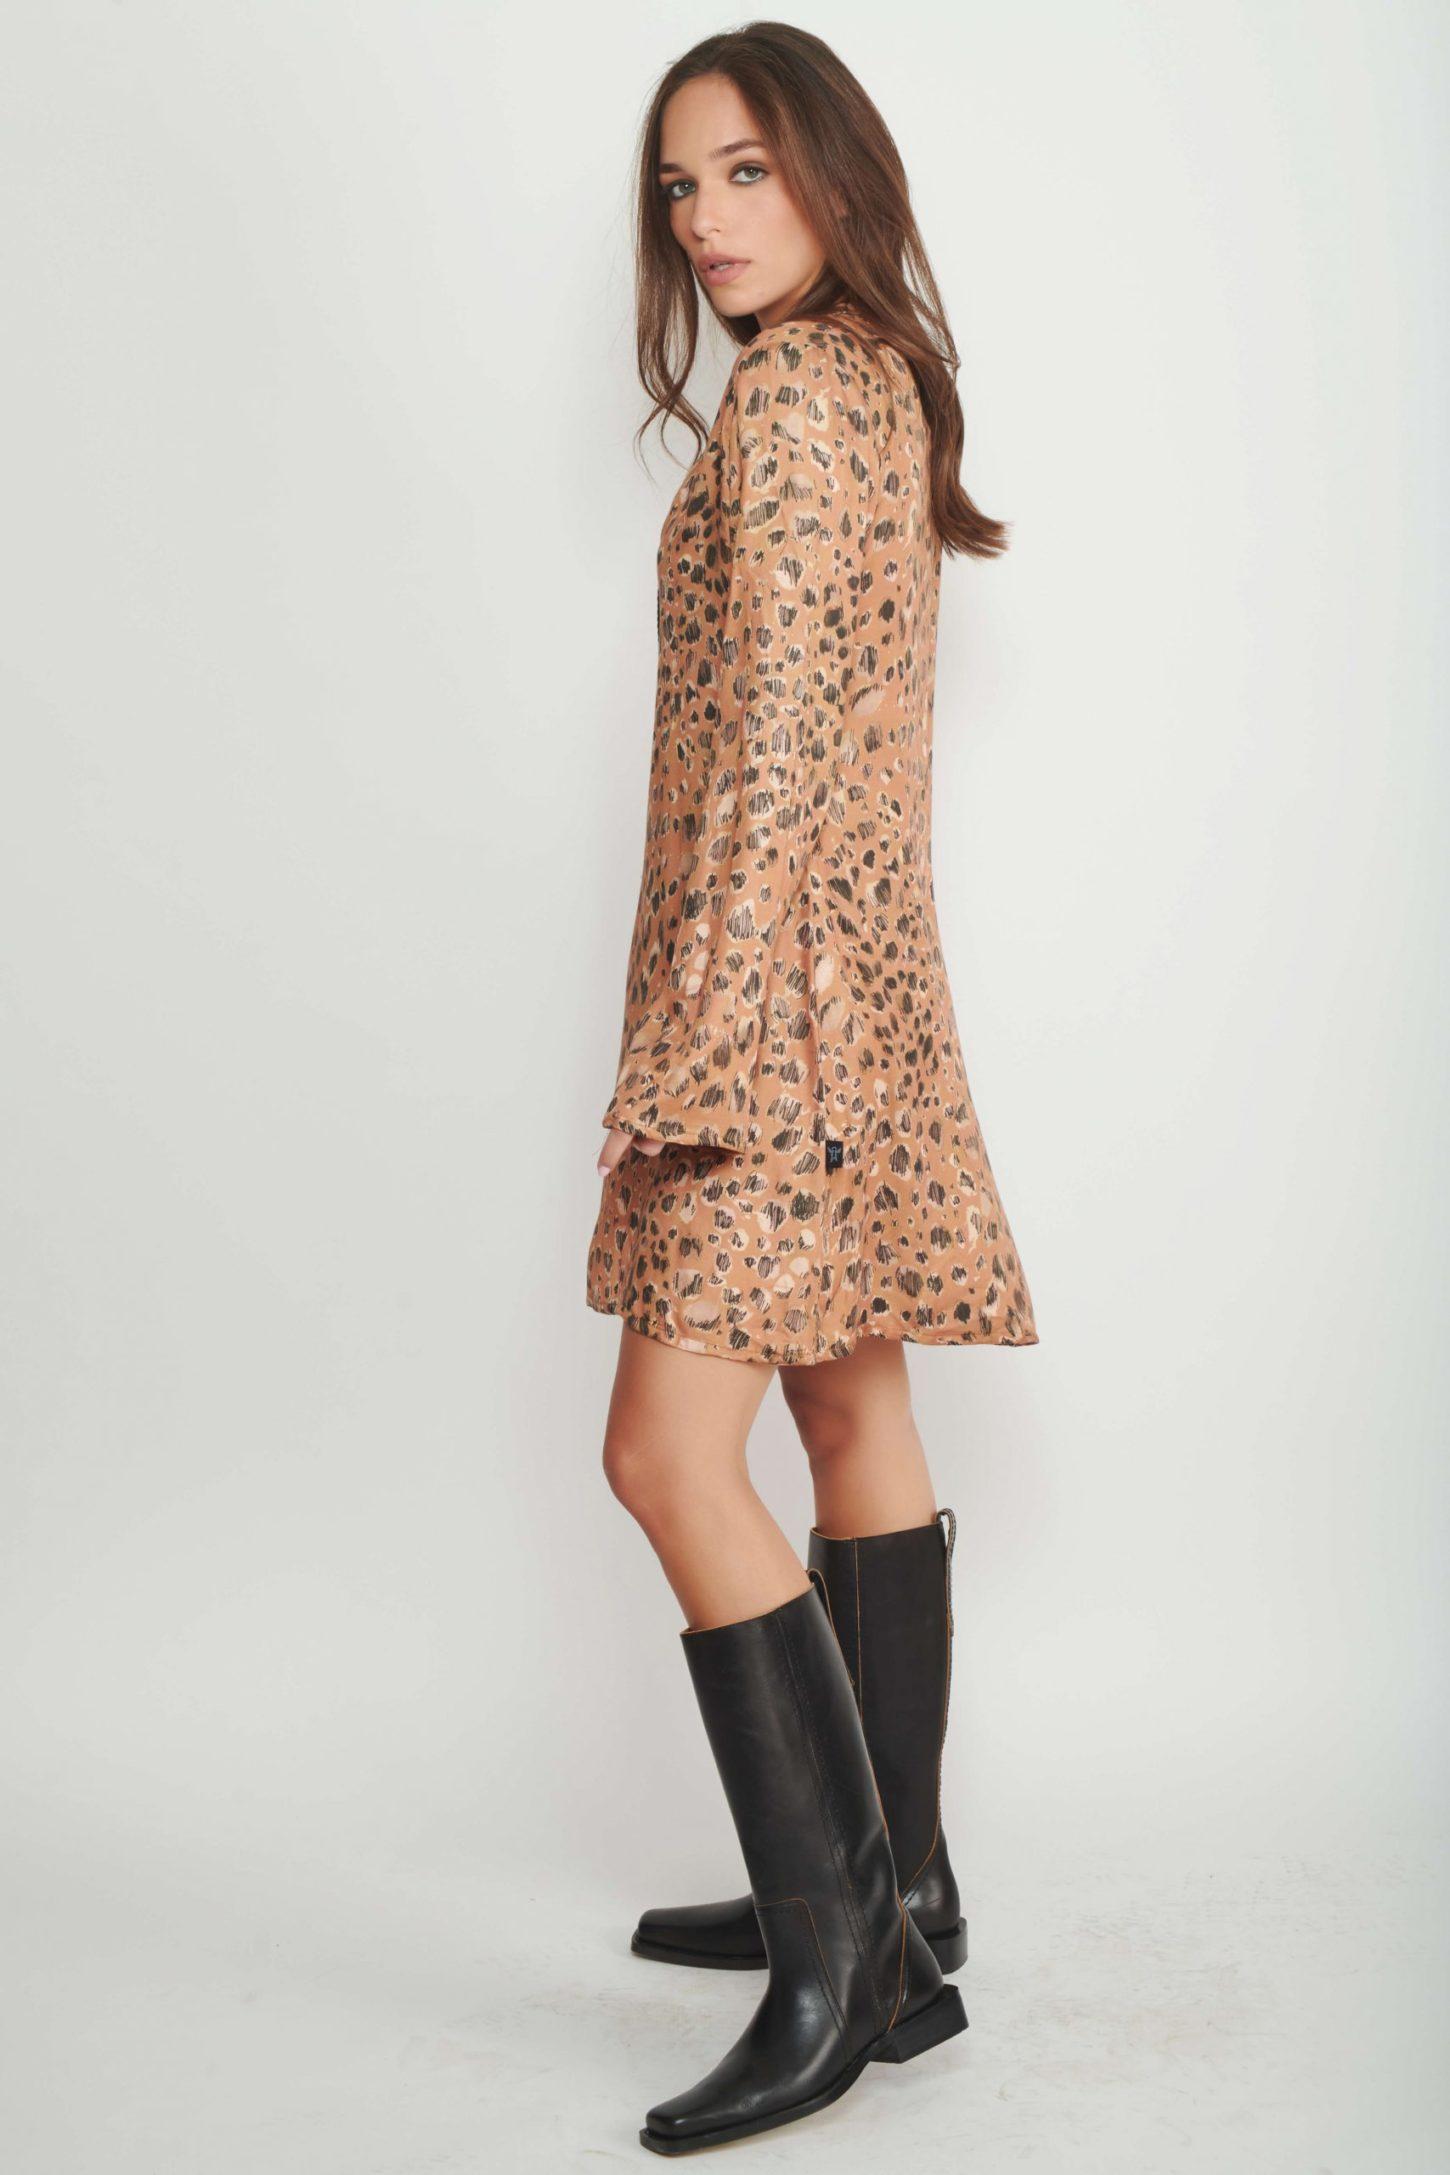 Tiger Eye Dress for Women